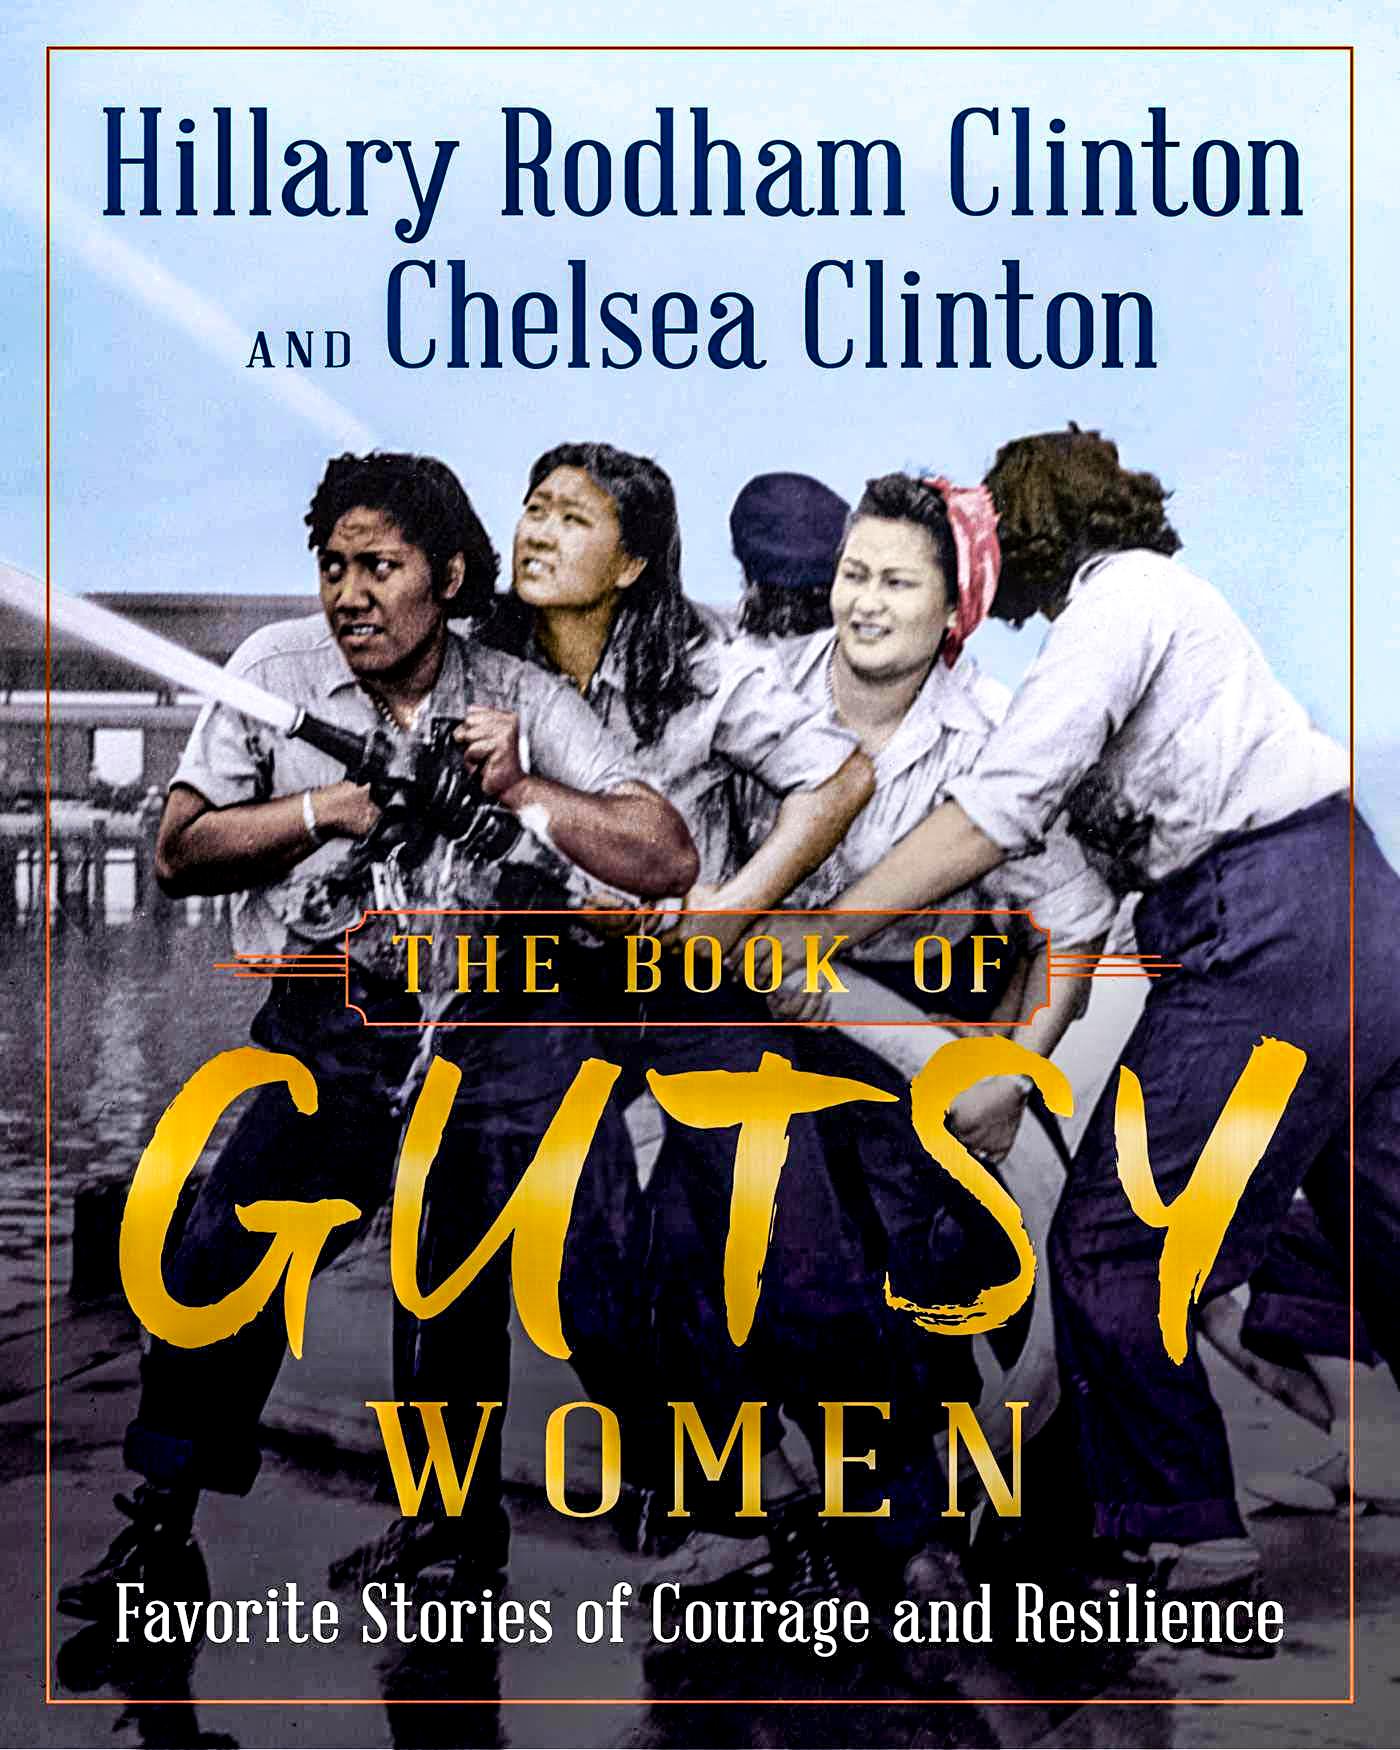 Gutsy Women Cover.jpg